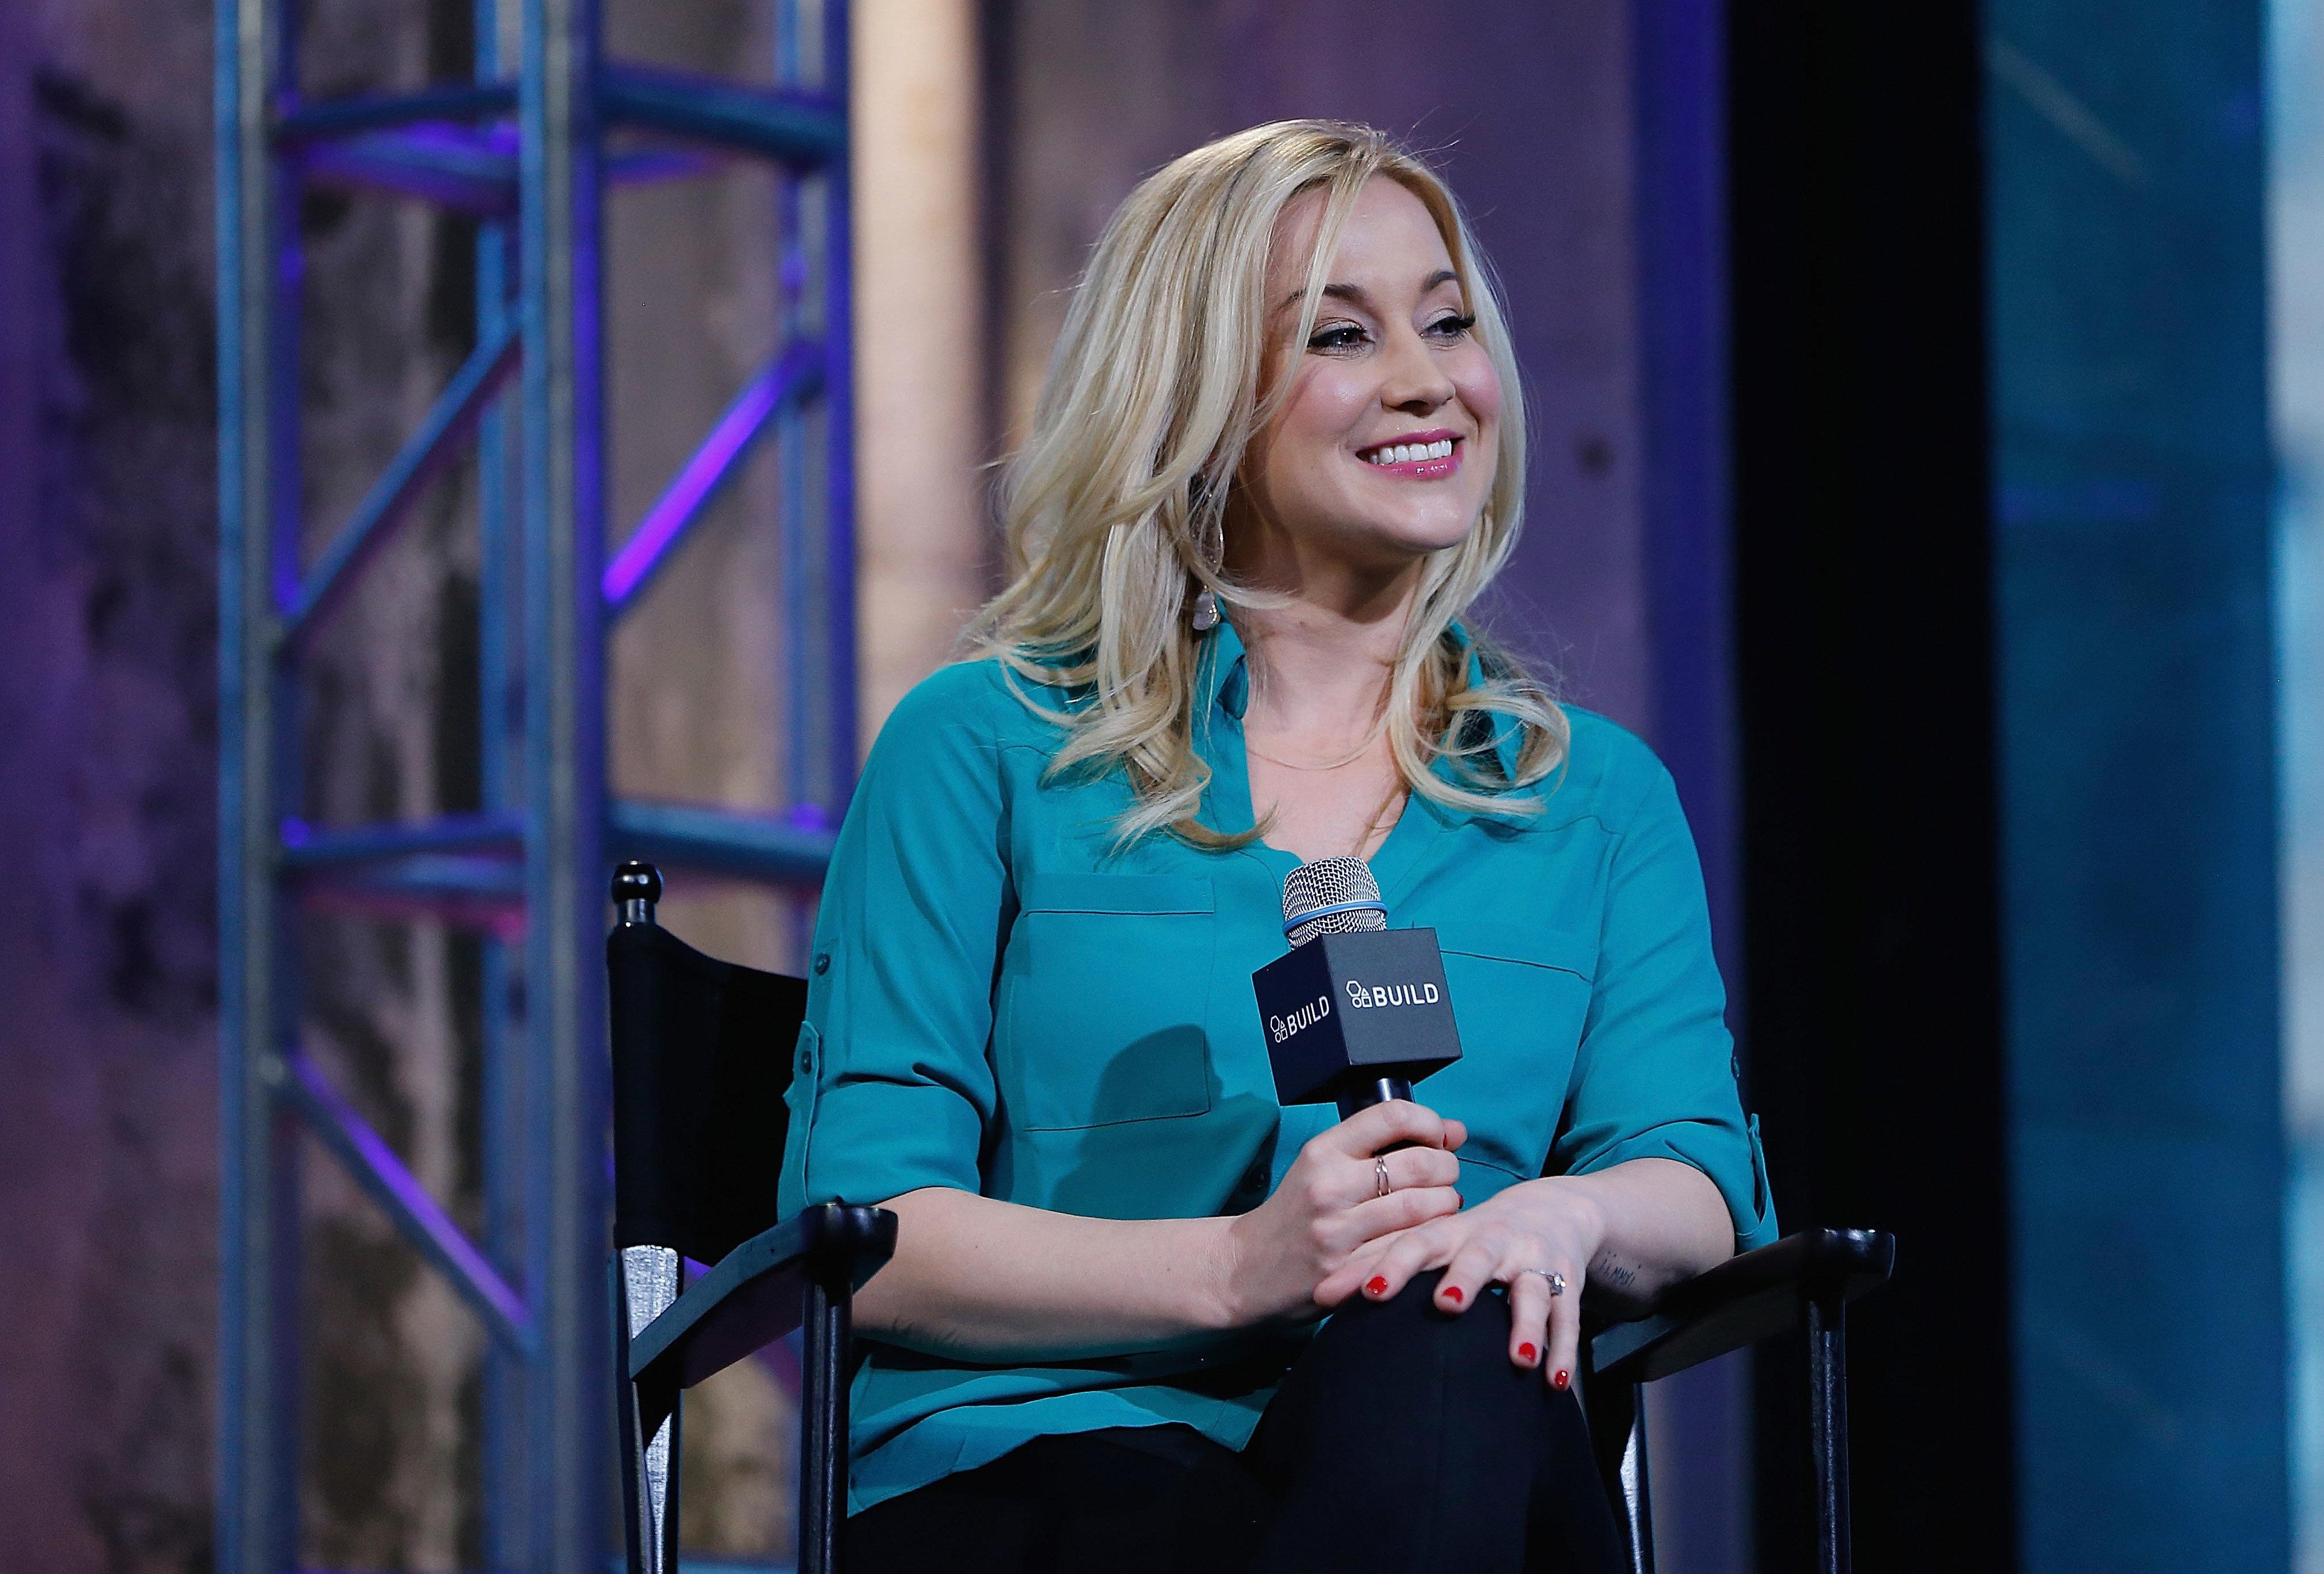 NEW YORK, NY - APRIL 18:  Kellie Pickler attends AOL Build Speaker Series at AOL Studios In New York on April 18, 2016 in New York City.  (Photo by John Lamparski/WireImage)